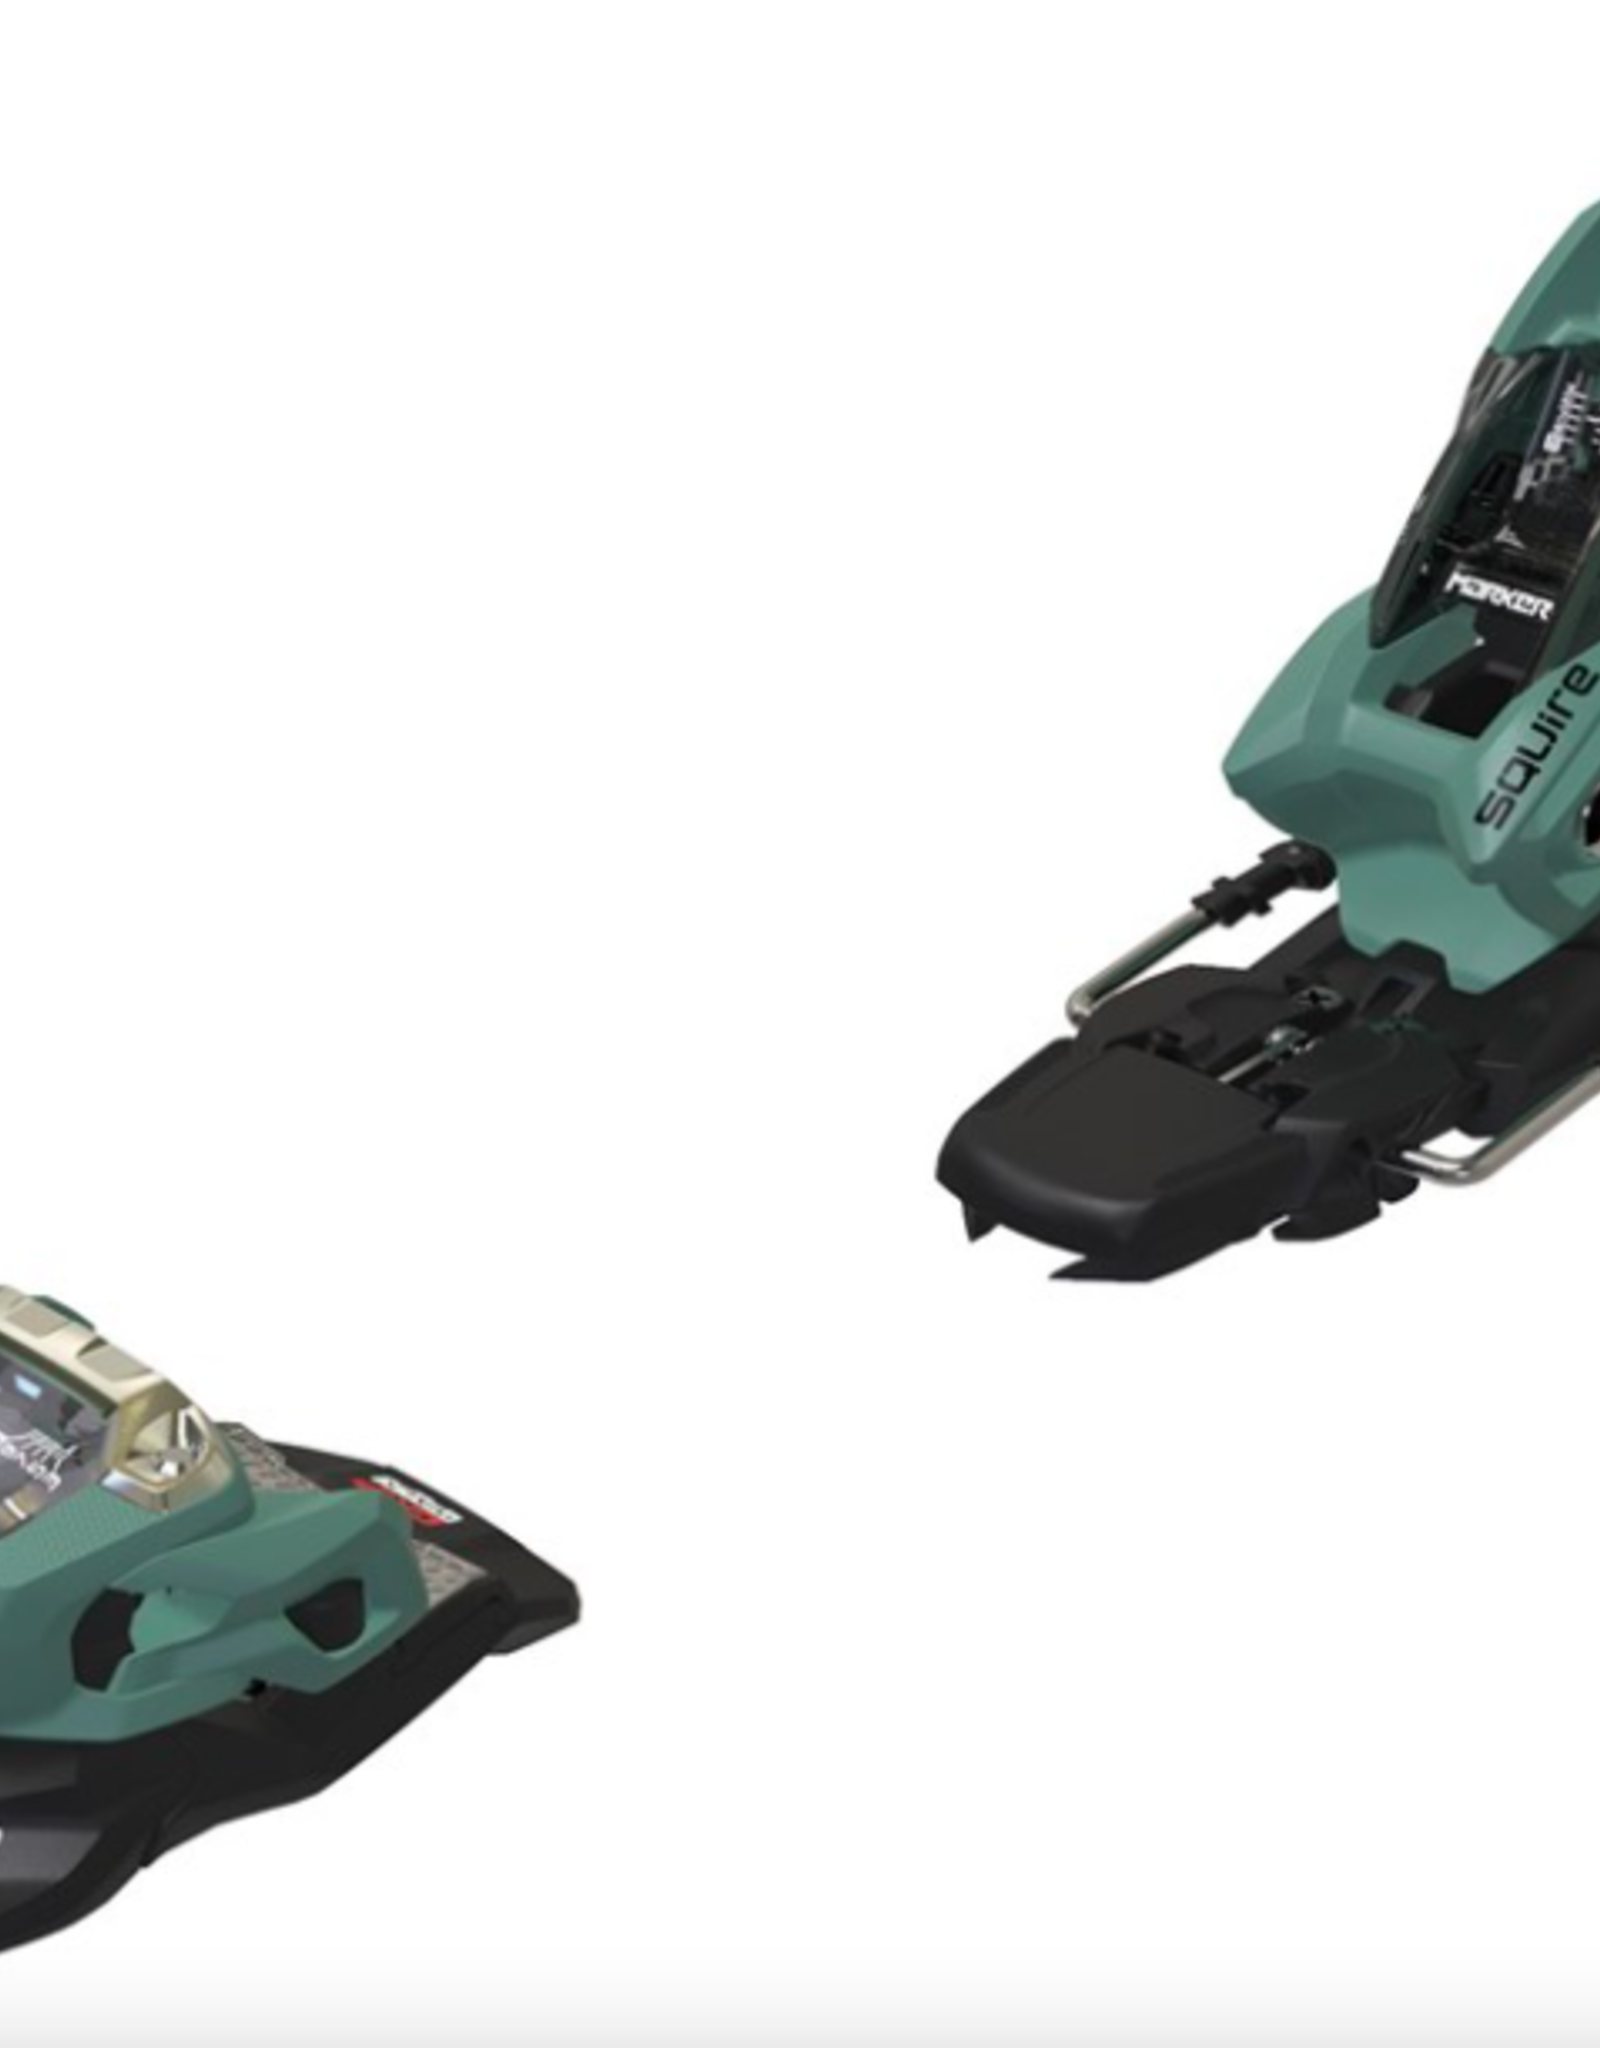 Marker Squire 11 Ski Bindings Green/Black 2022